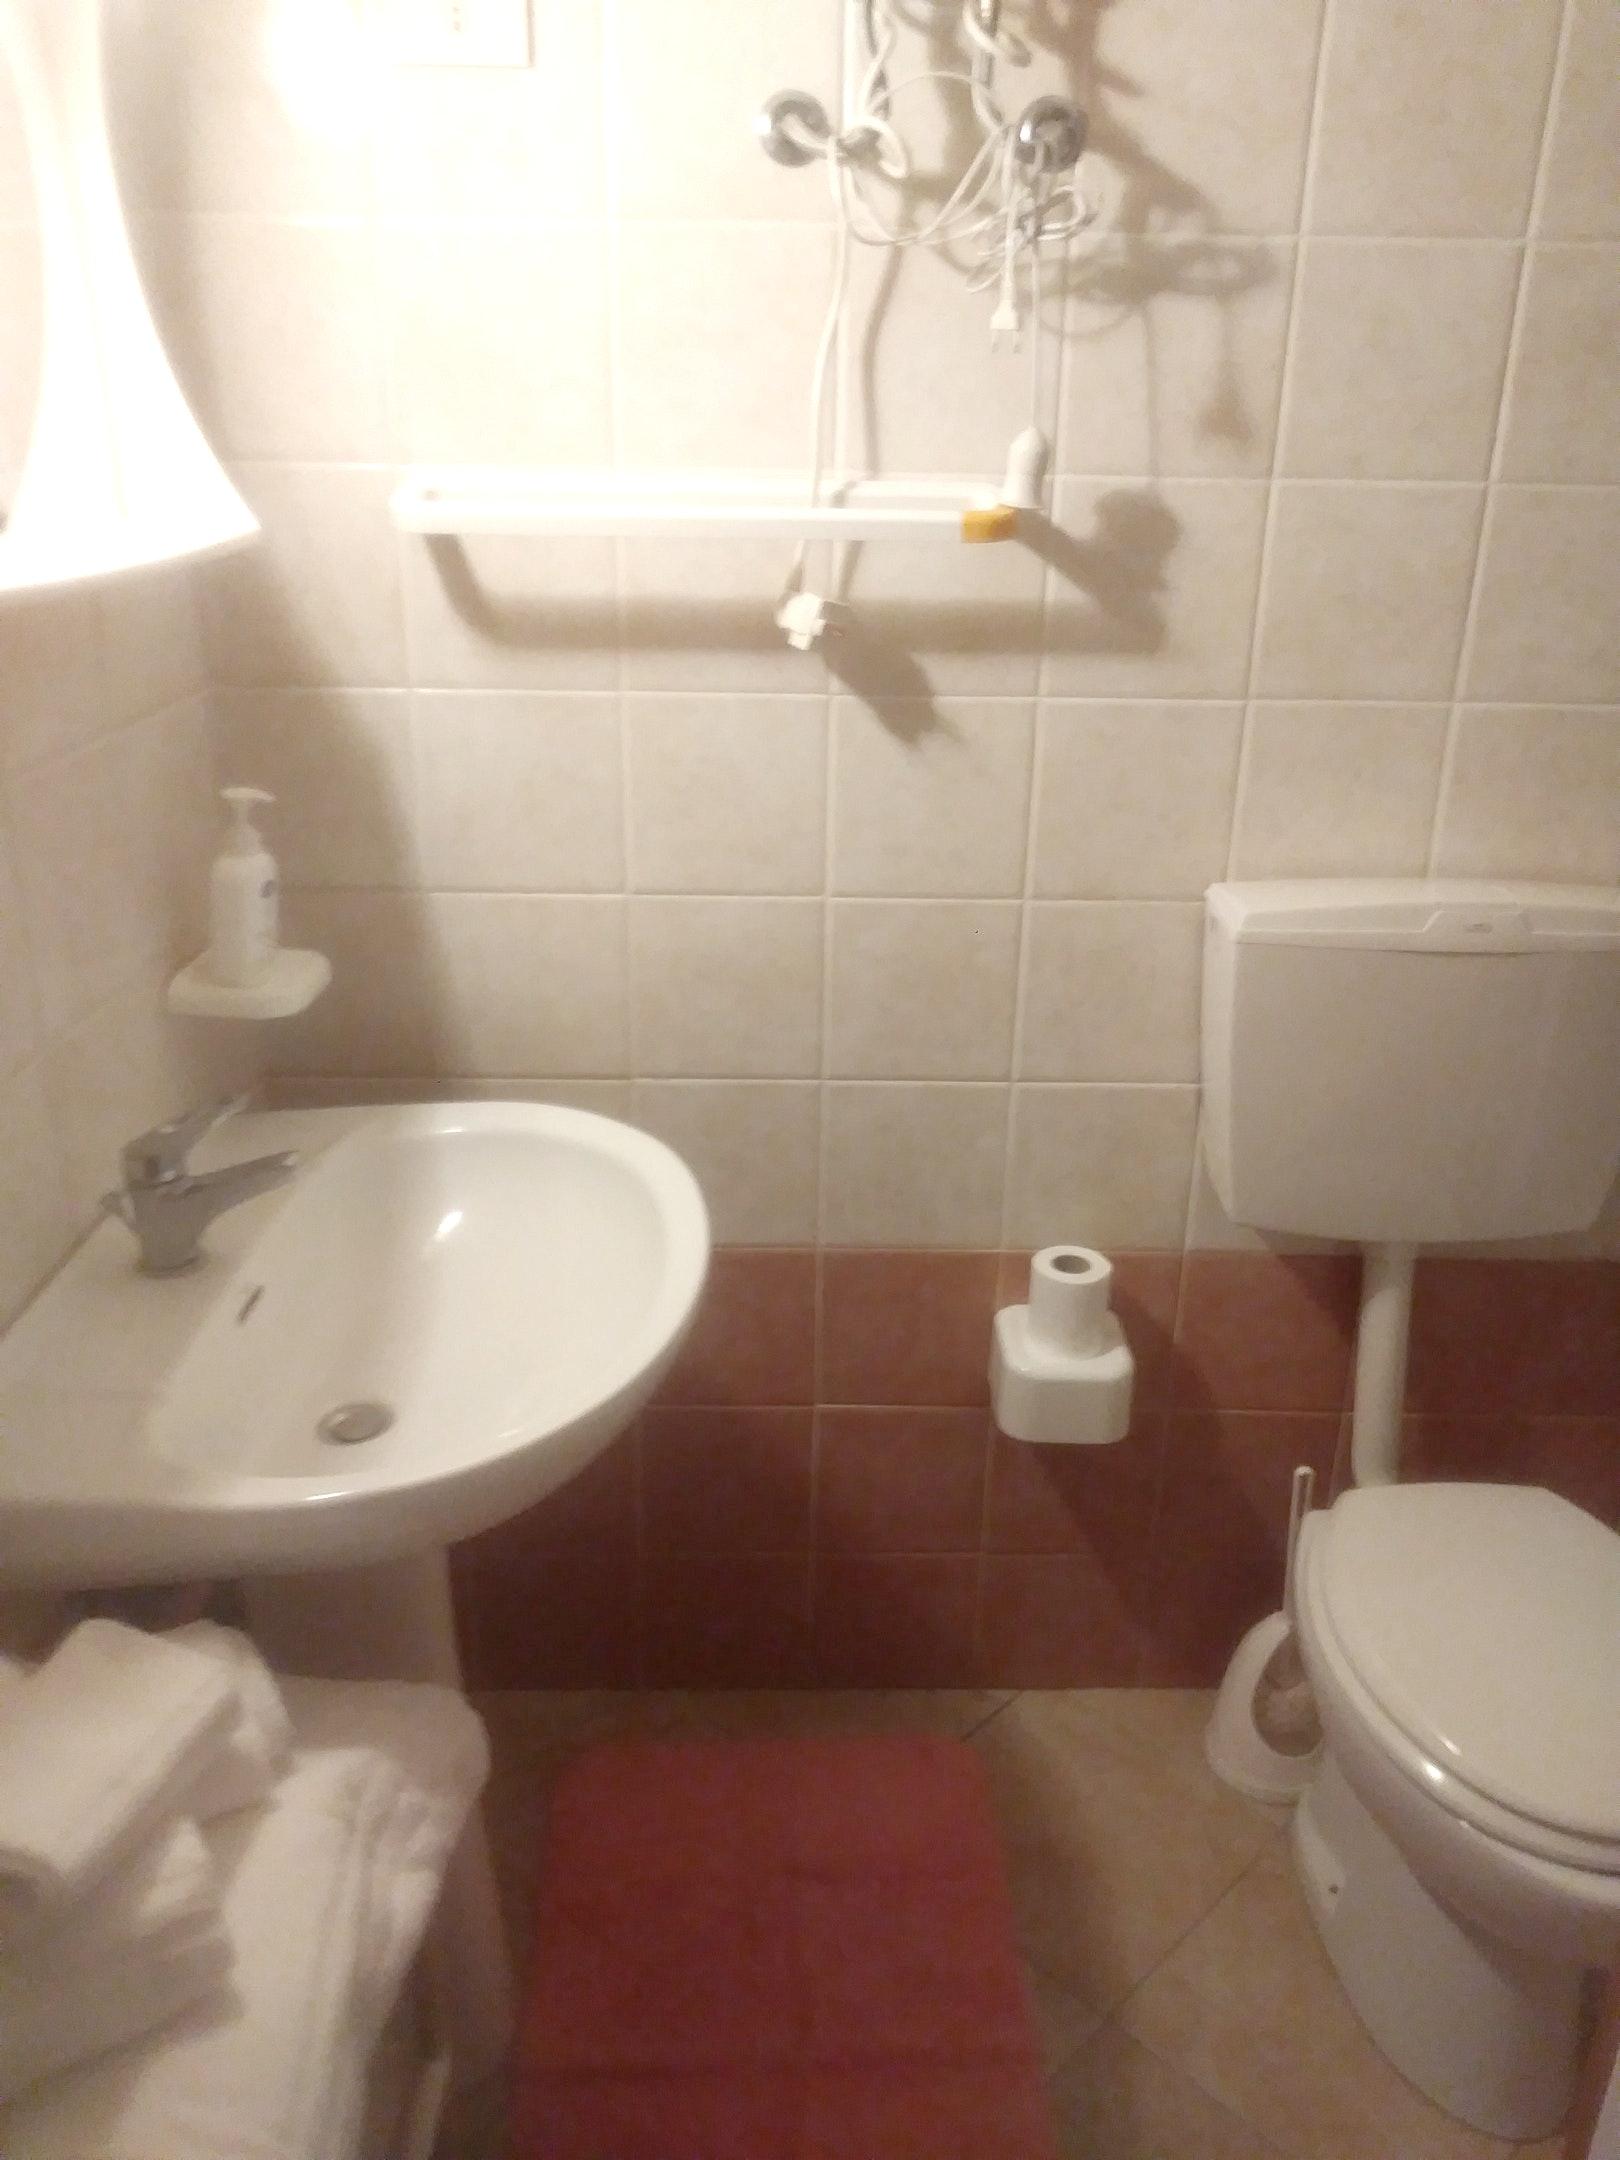 Appartement de vacances Studio in Campofelice di Roccella - 1 km vom Strand entfernt (2489579), Campofelice di Roccella, Palermo, Sicile, Italie, image 8